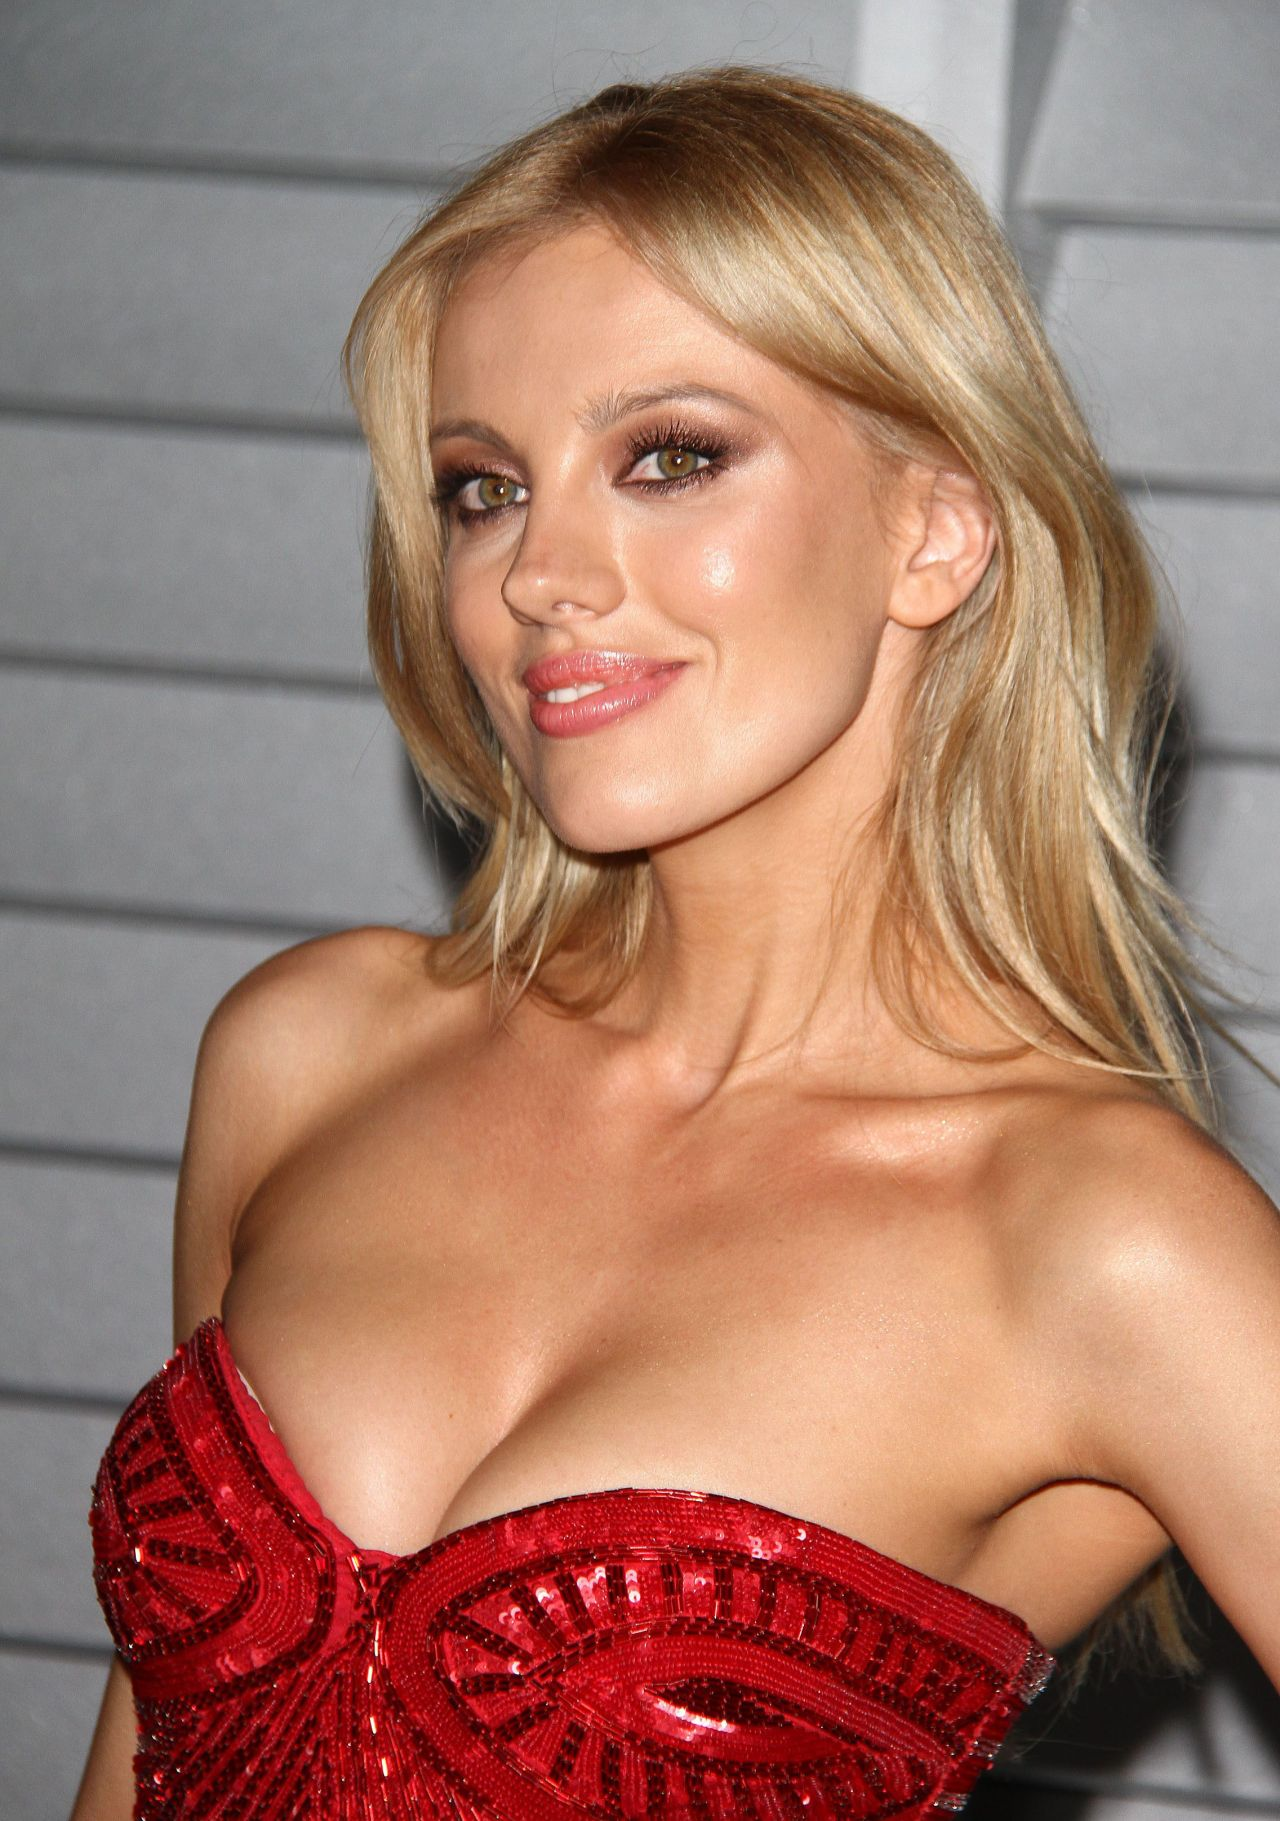 nude (55 photo), Paparazzi Celebrites photos